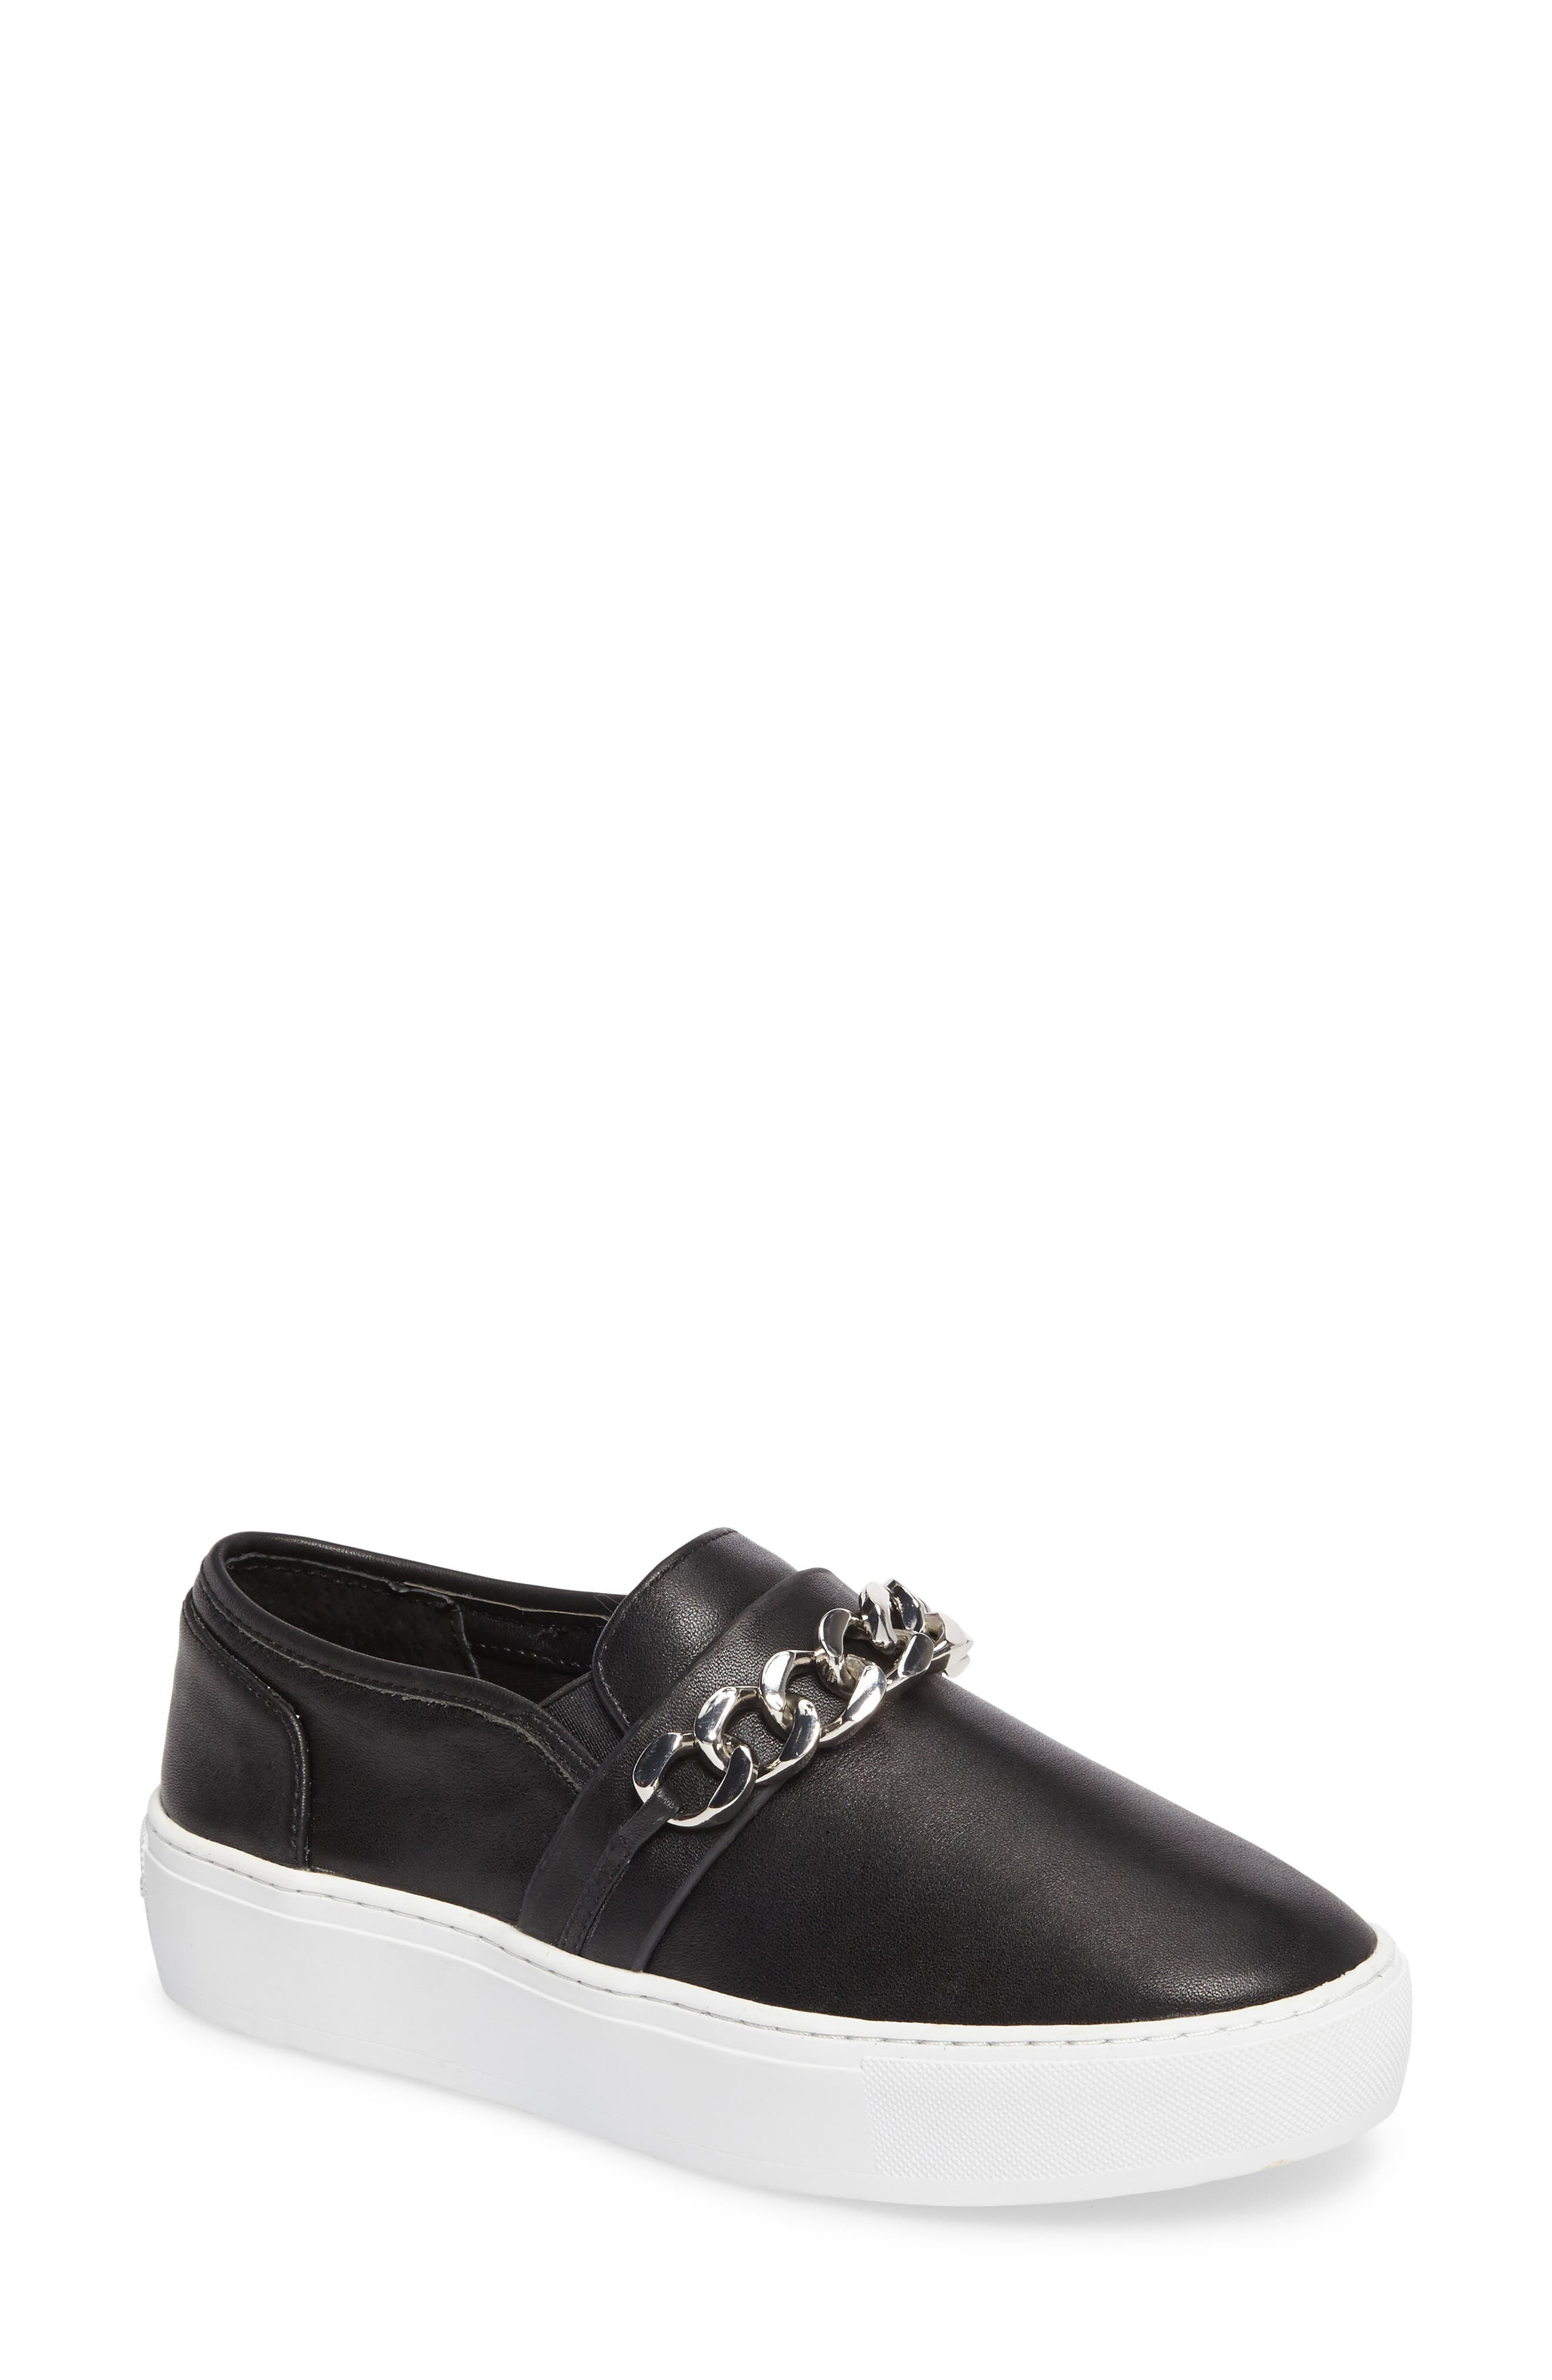 Nala Slip-On Sneaker,                         Main,                         color, Black Leather